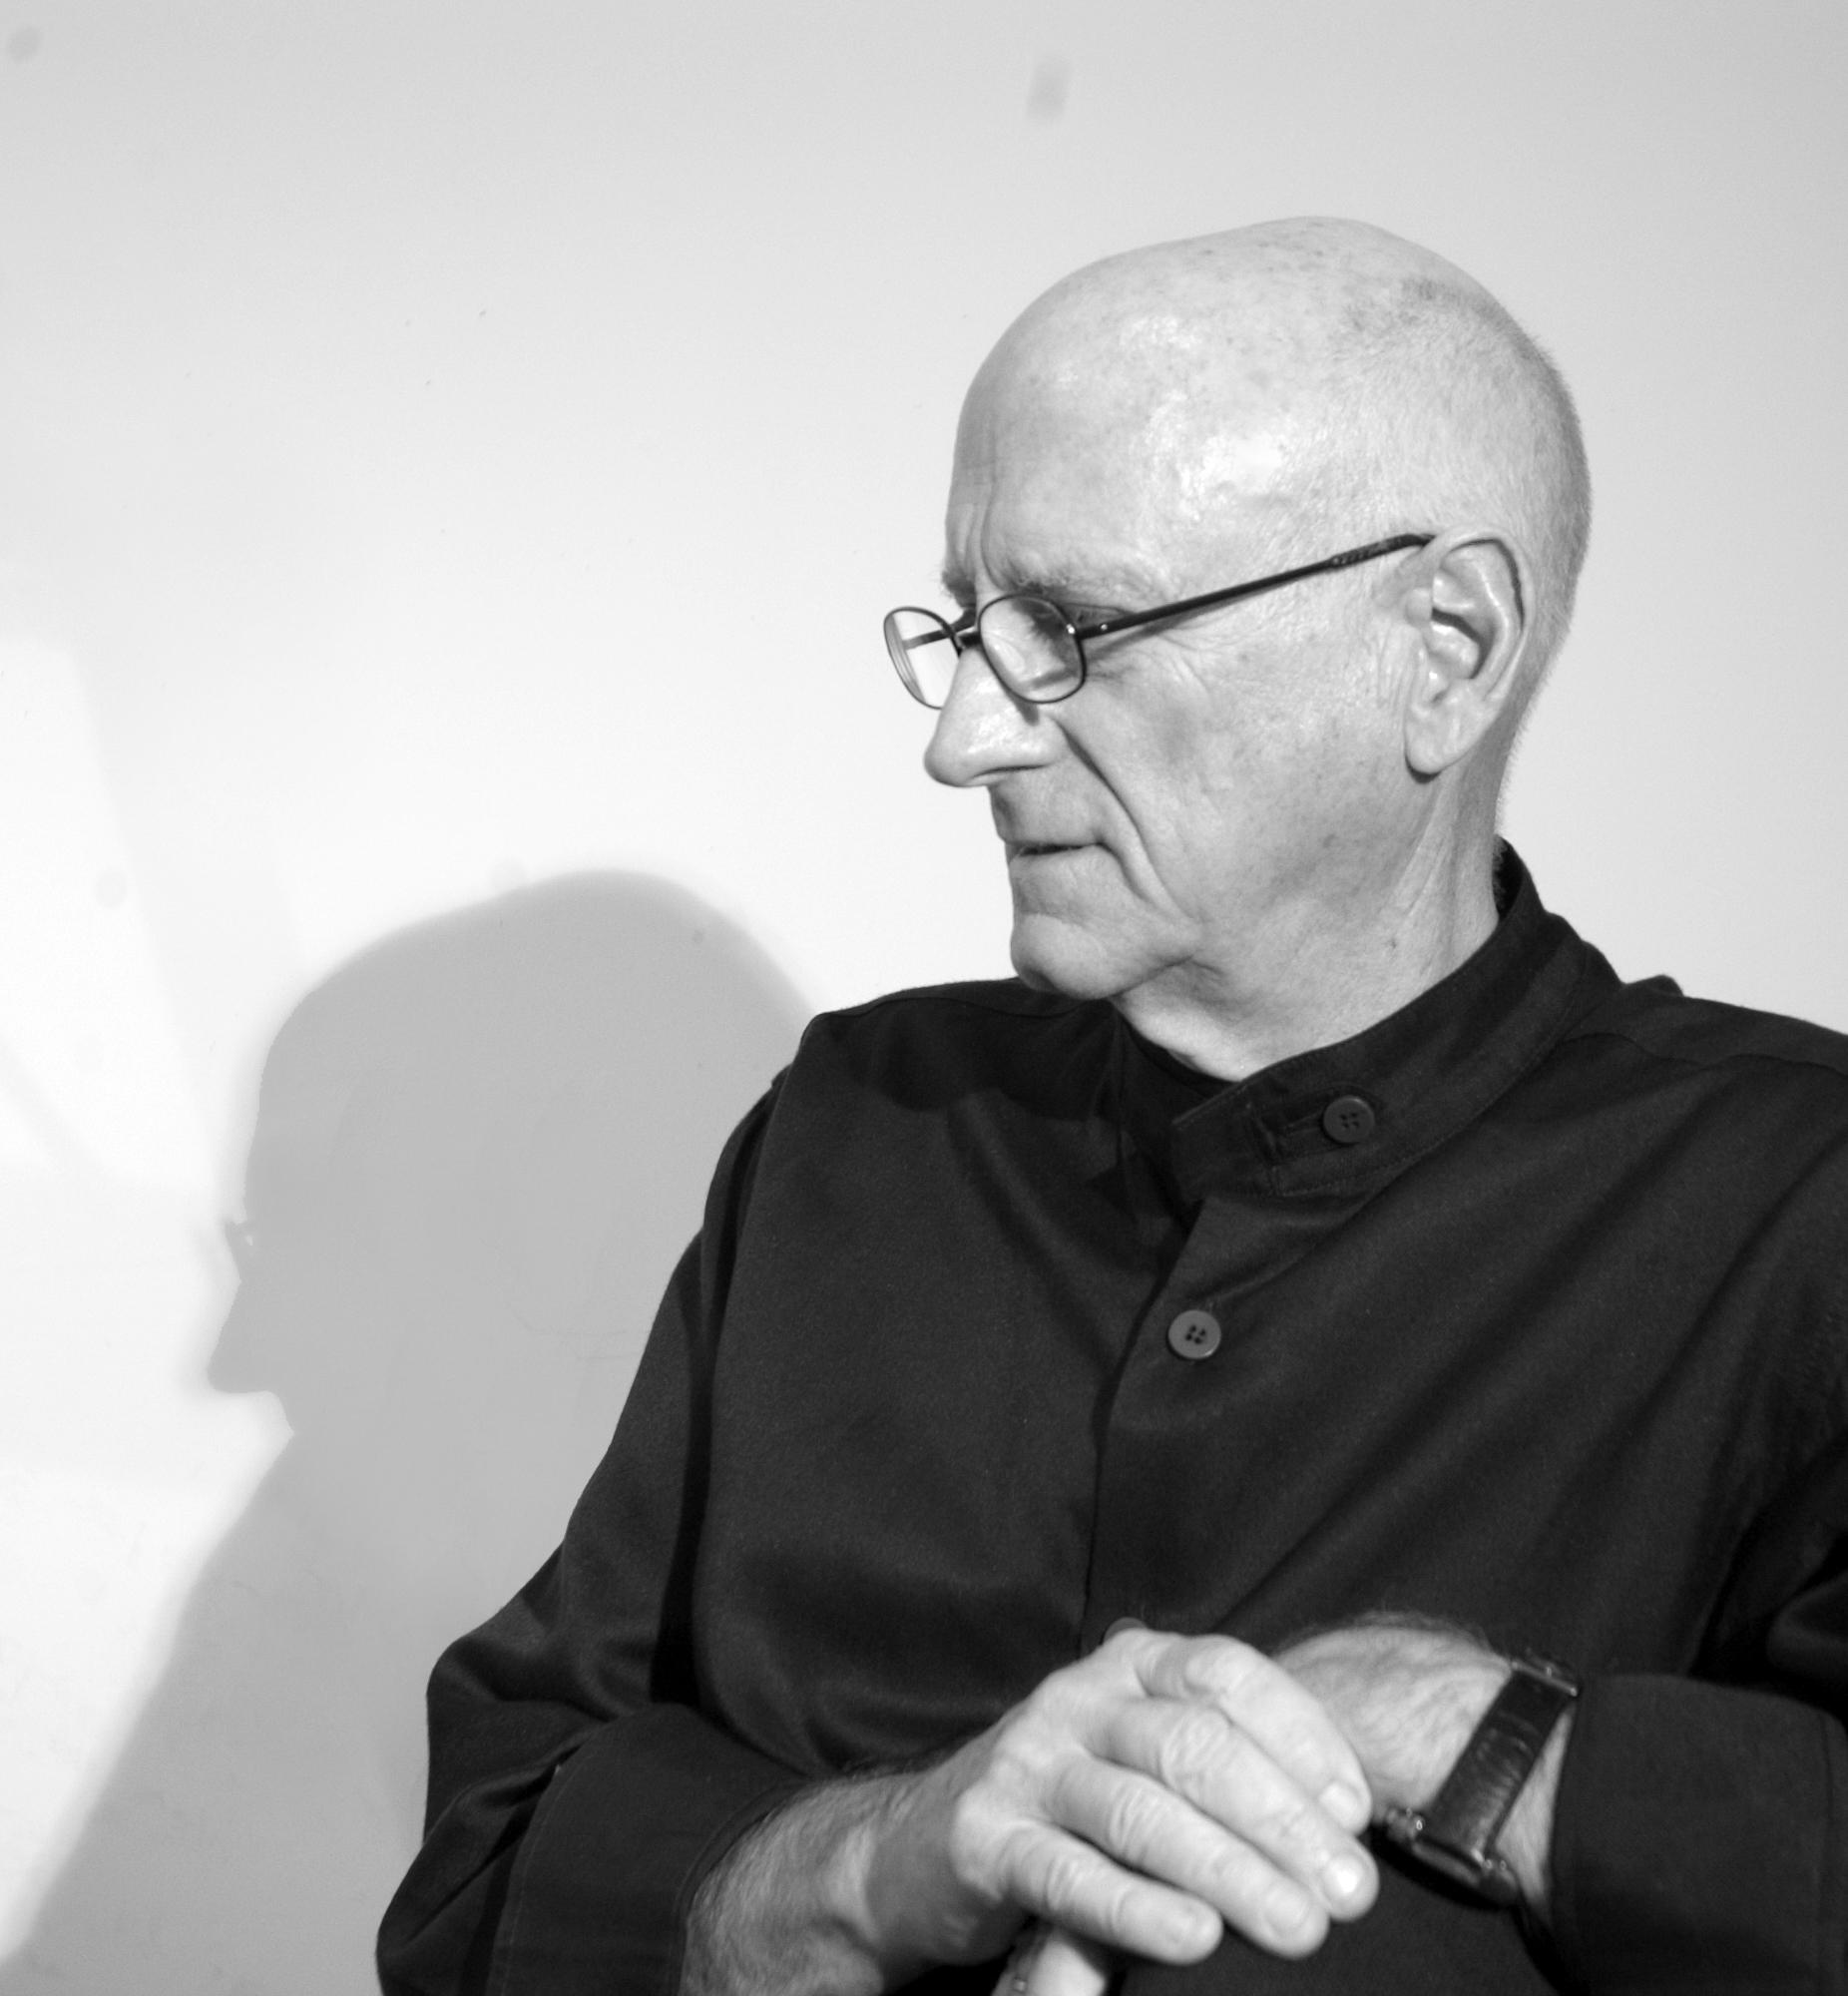 Mack head shot for publication_ credit Rubi Xu